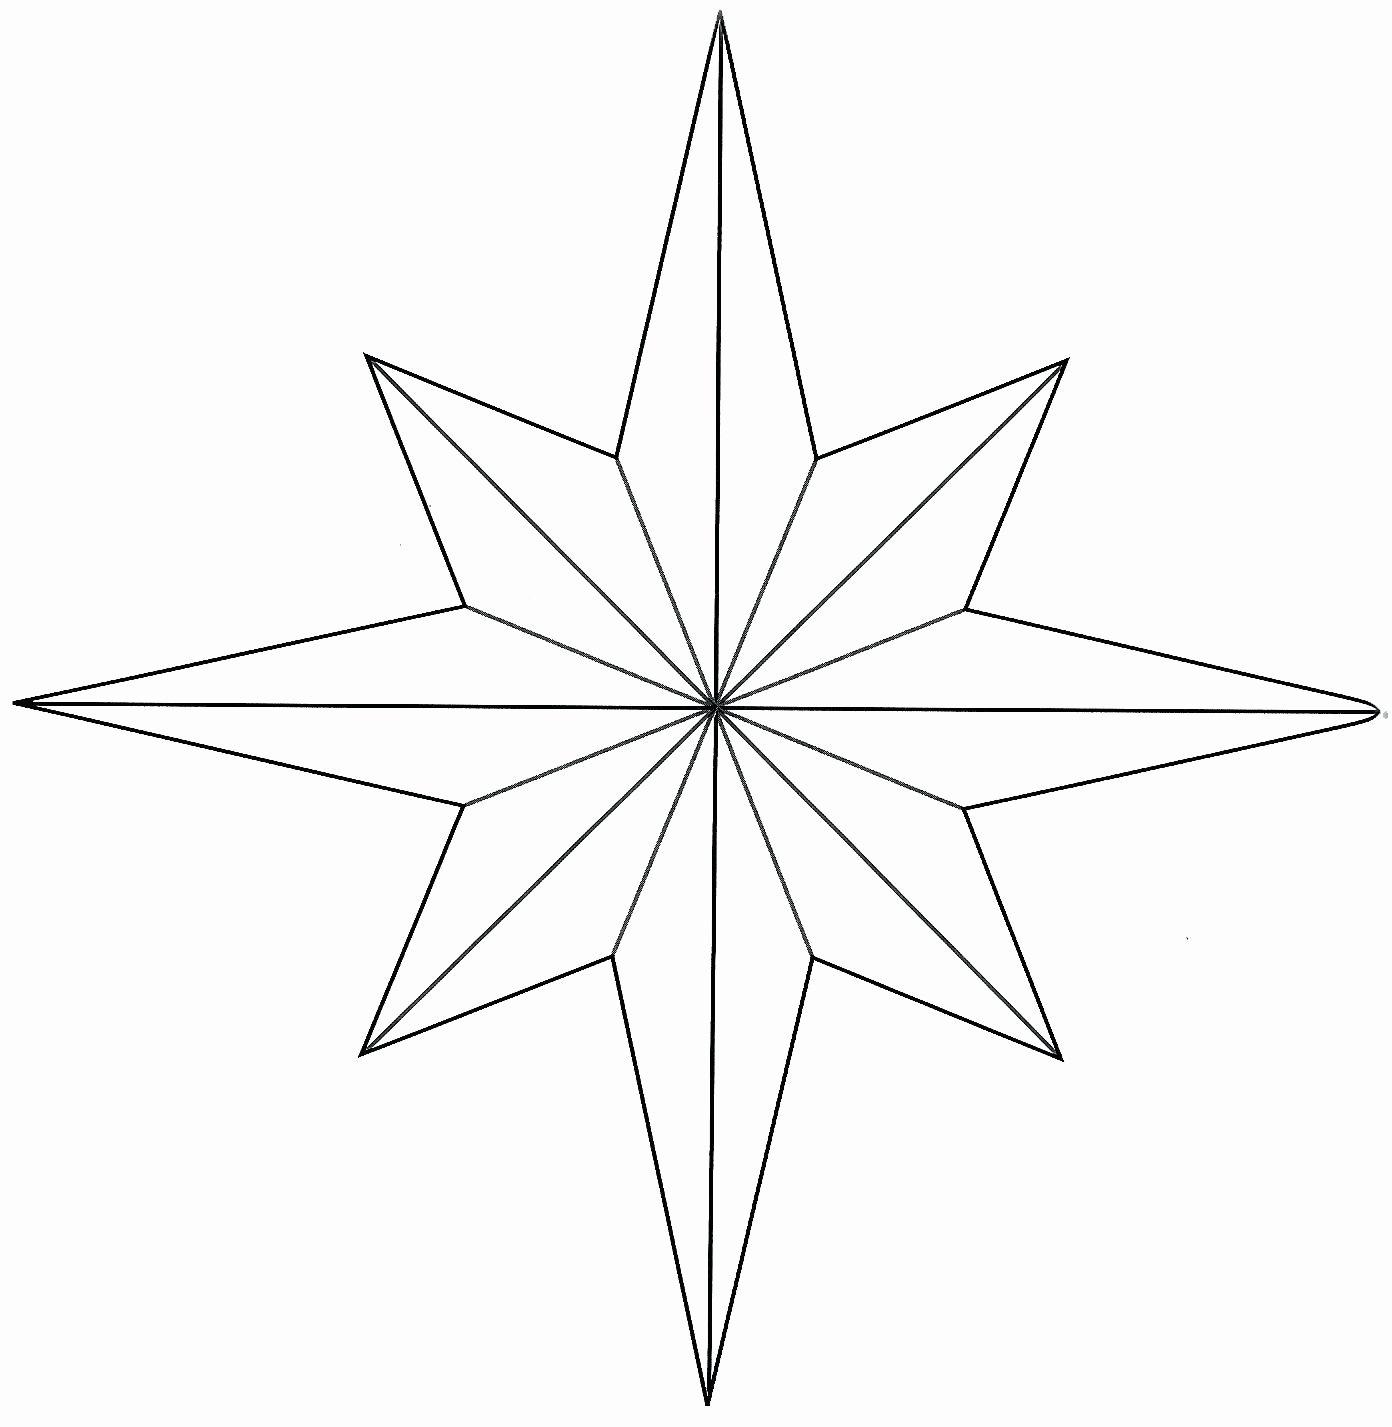 American Flag Star Stencil Printable Best Of Star Drawing Outline at Getdrawings